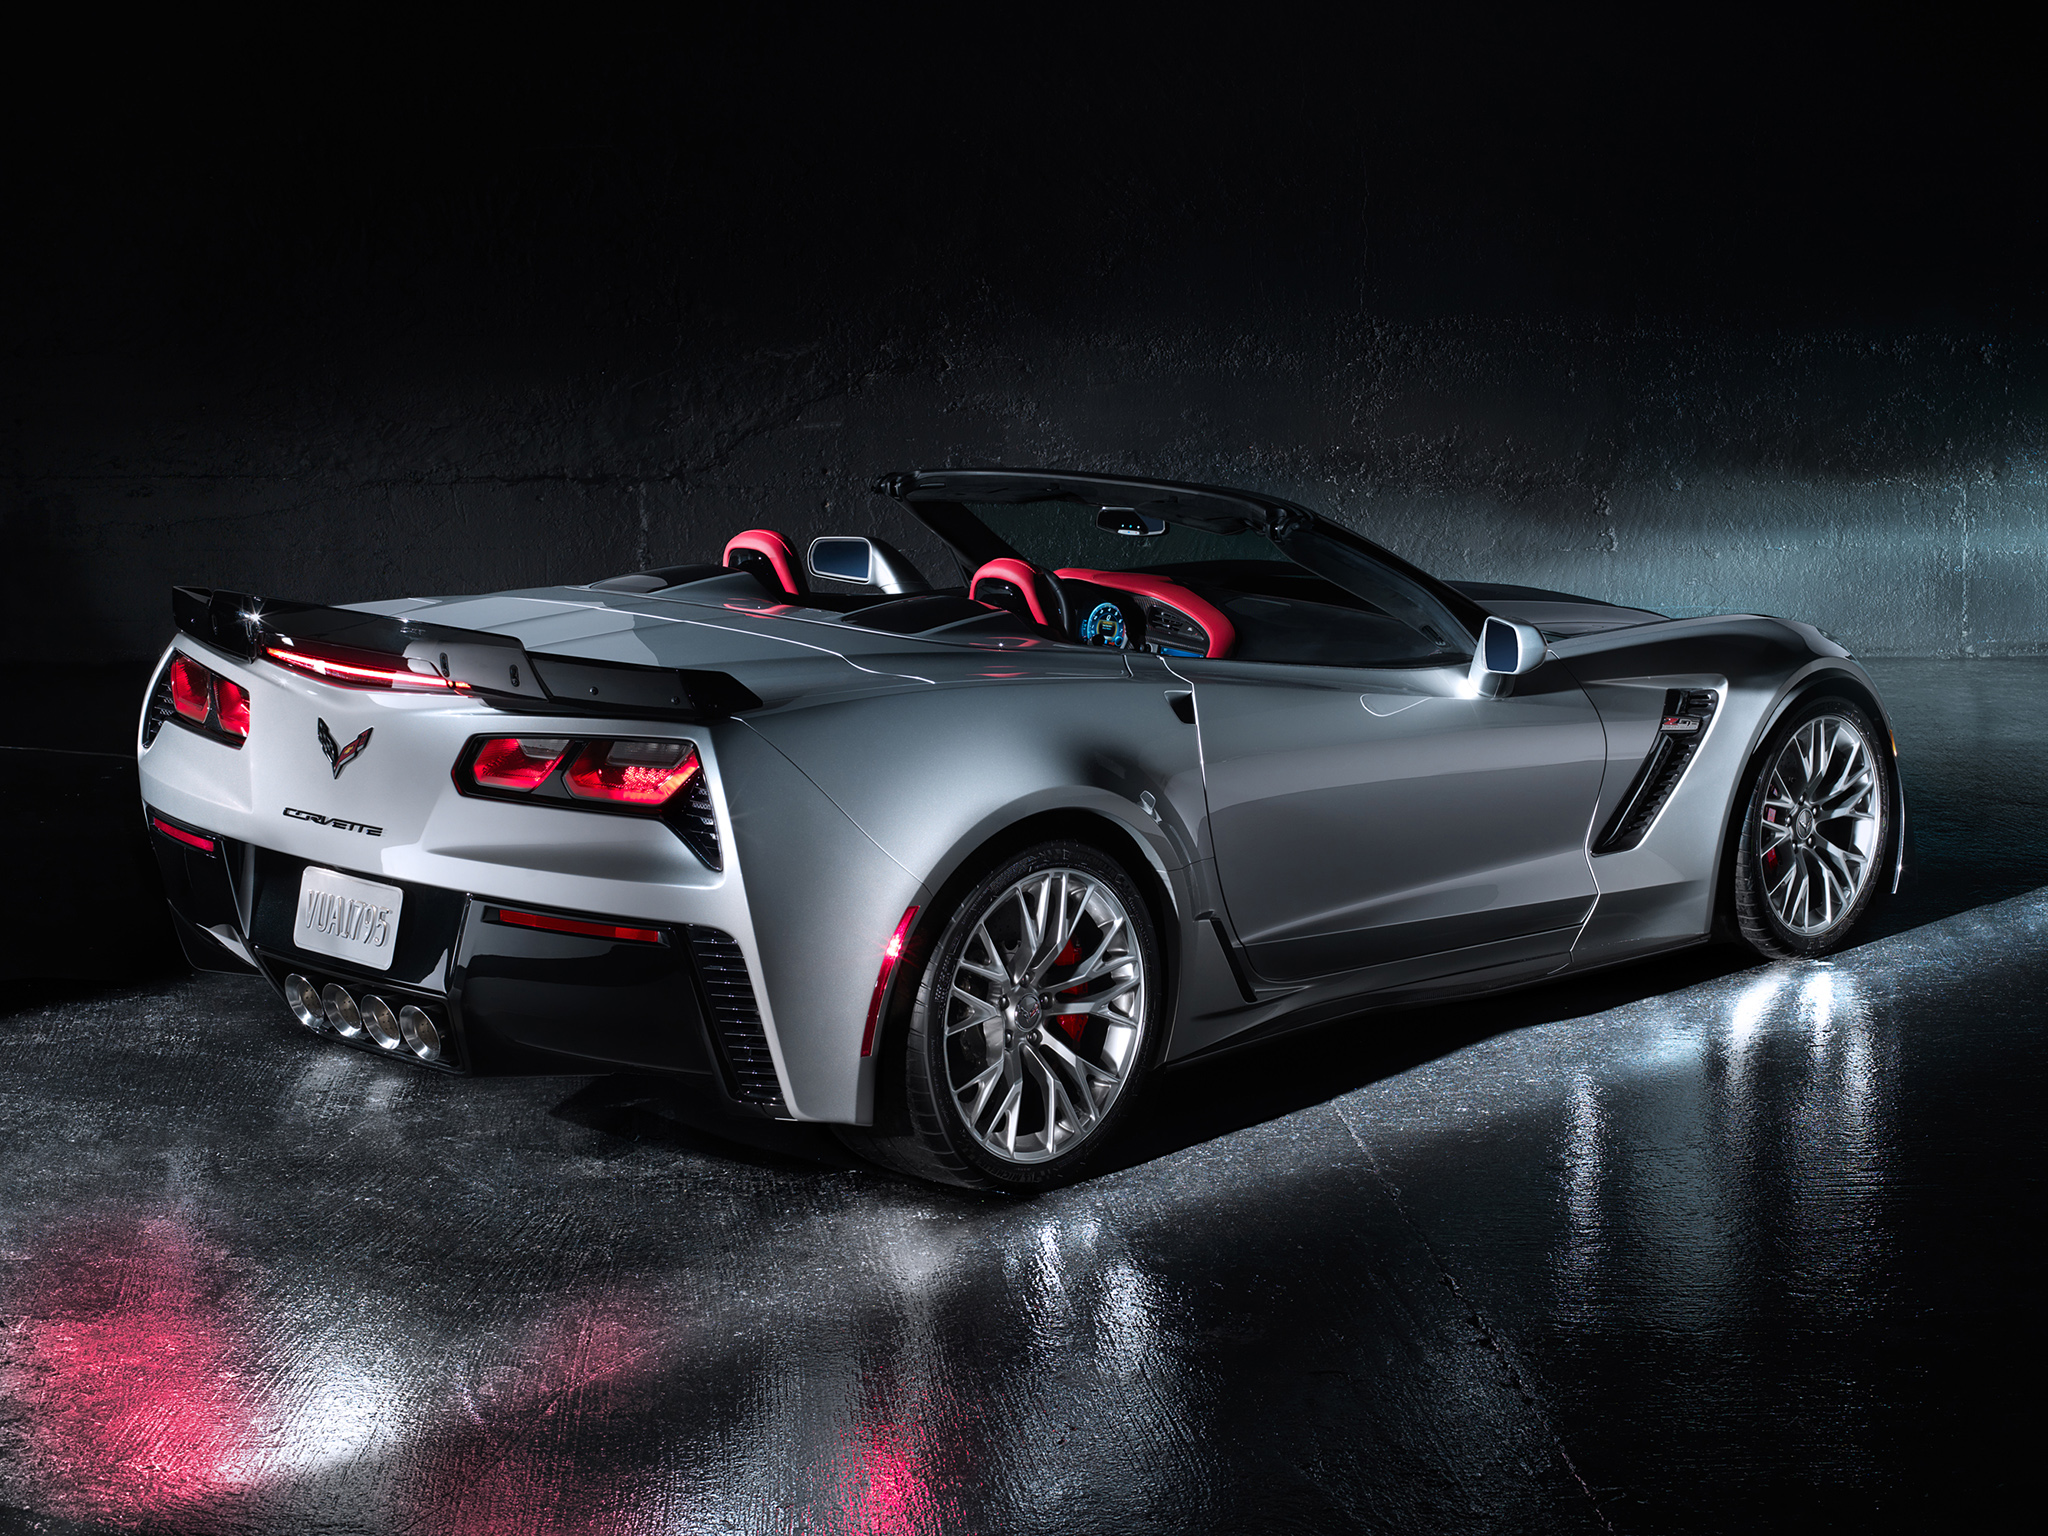 Corvette C7 Z06 Wallpaper 2048x1536